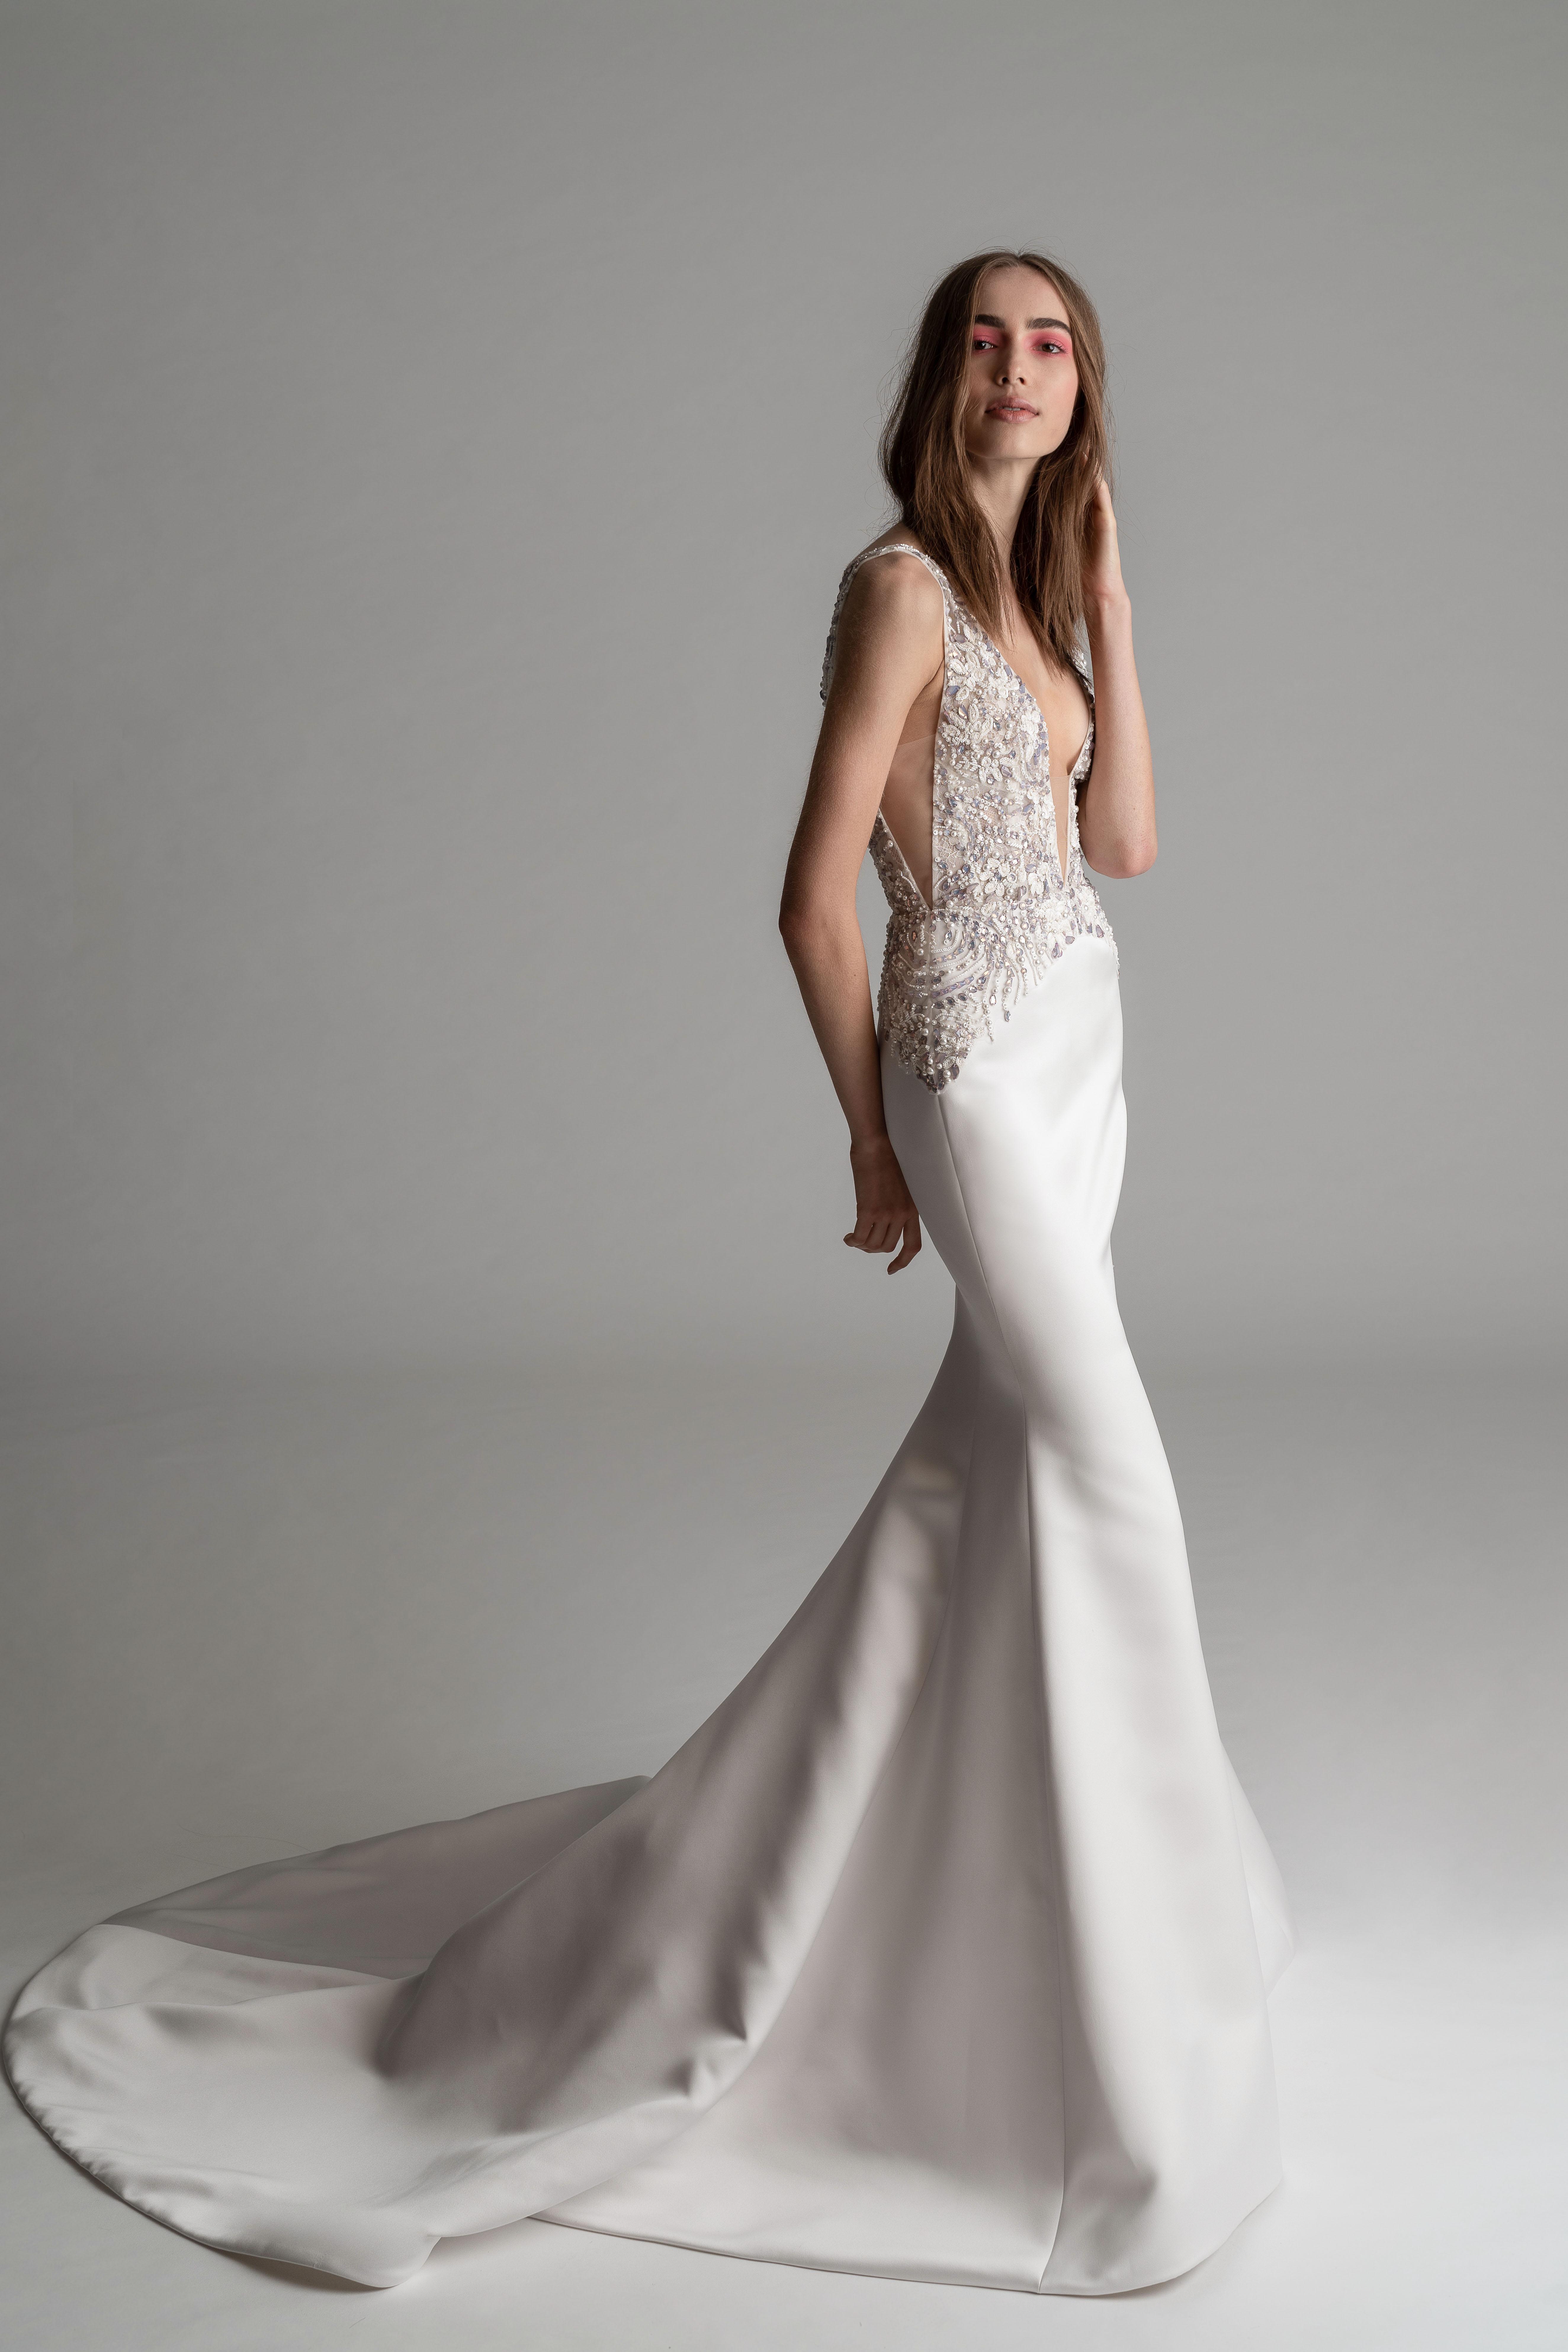 rivini by rita fall 2019 v-neck spaghetti strap trumpet wedding dress